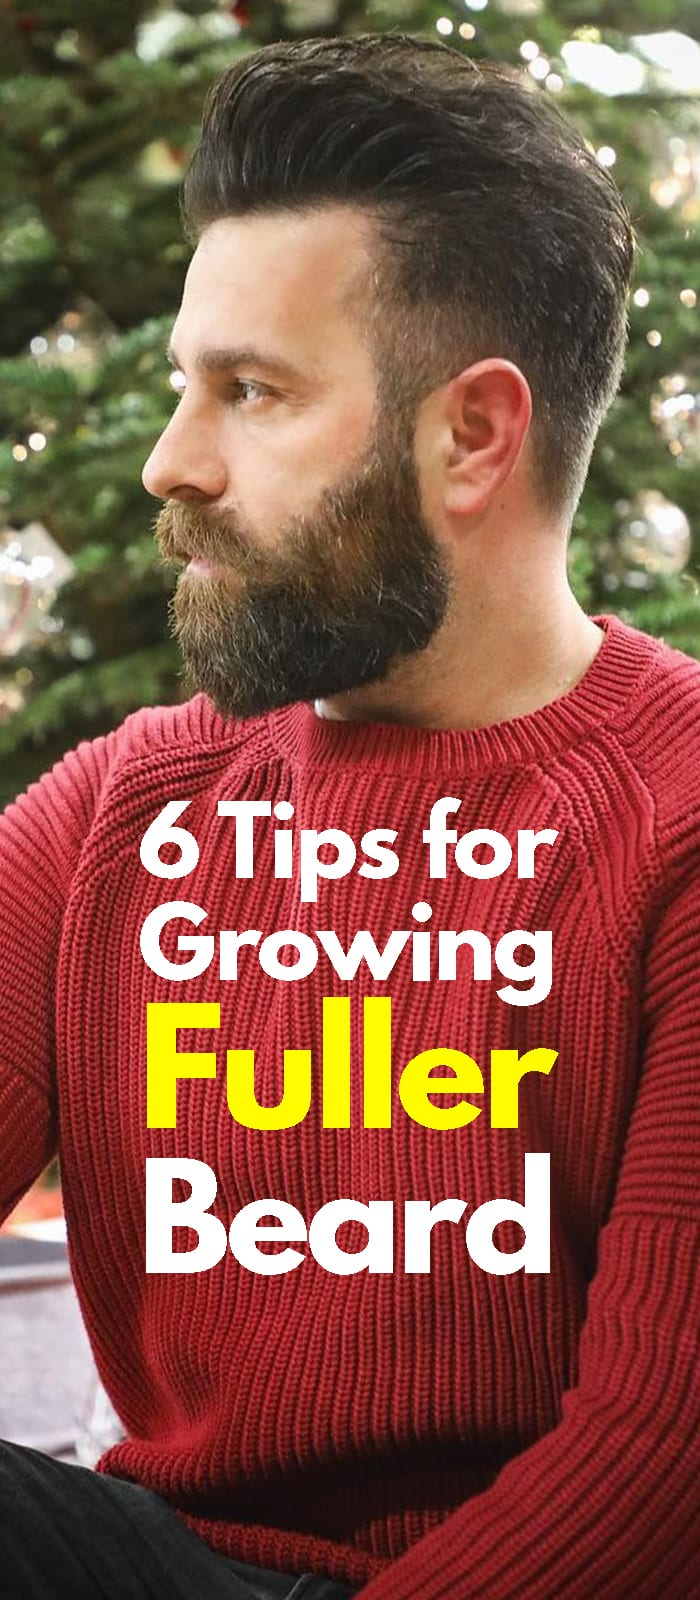 6 Tips For Growing a Full Beard.